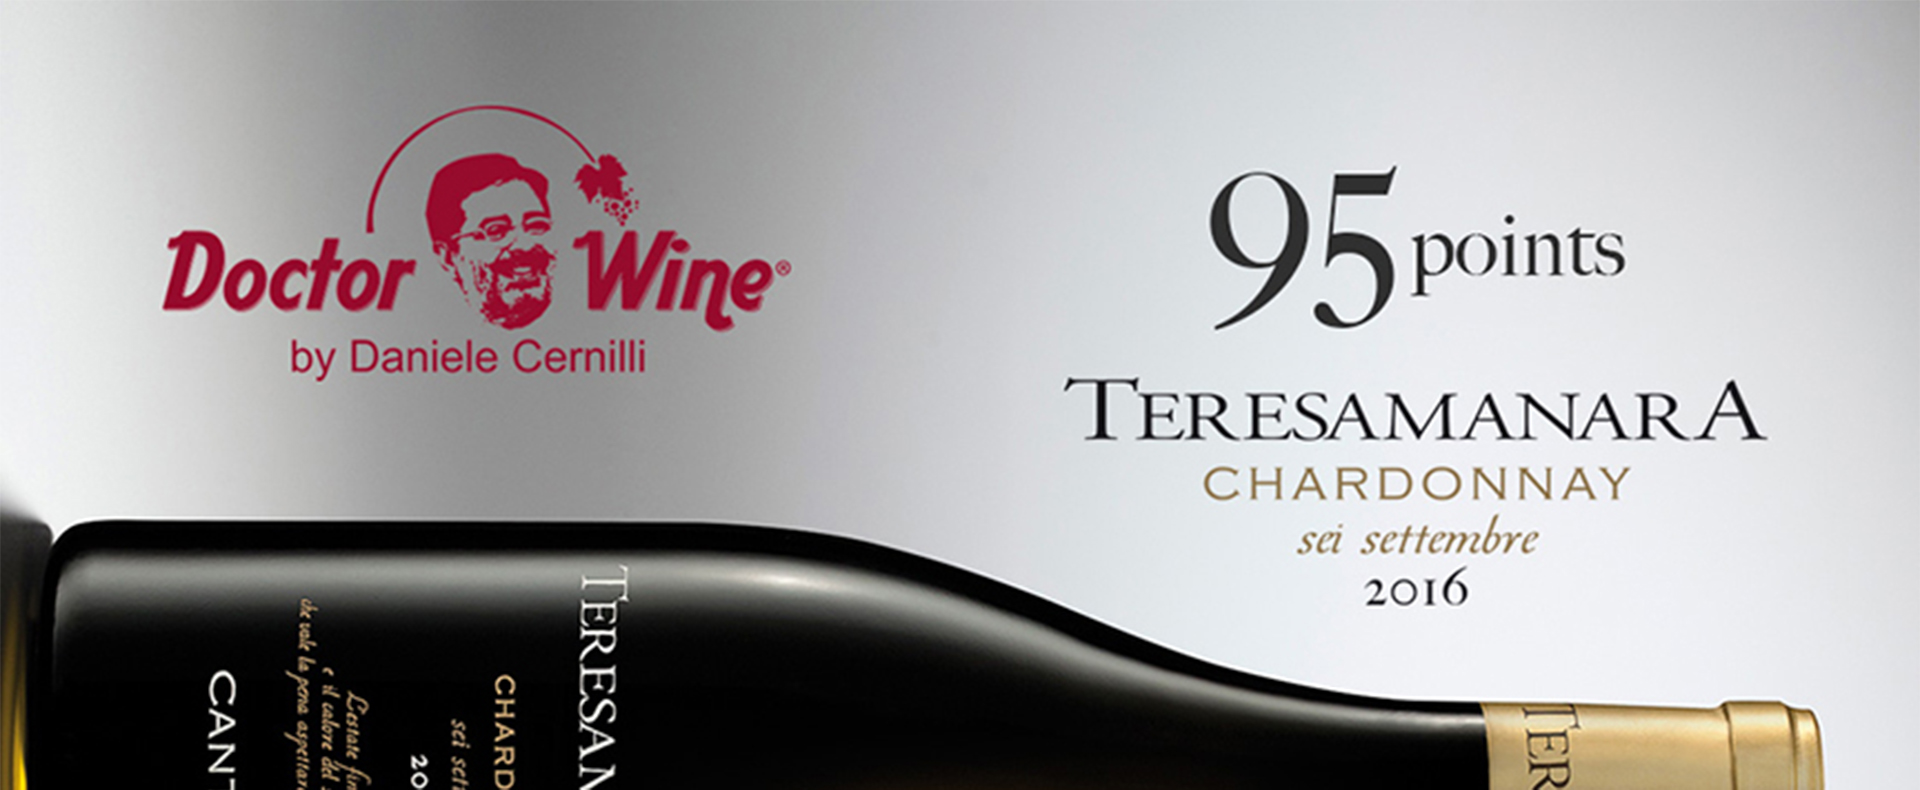 95 points for Teresa Manara Chardonnay from Daniele Cernilli and Doctor Wine!